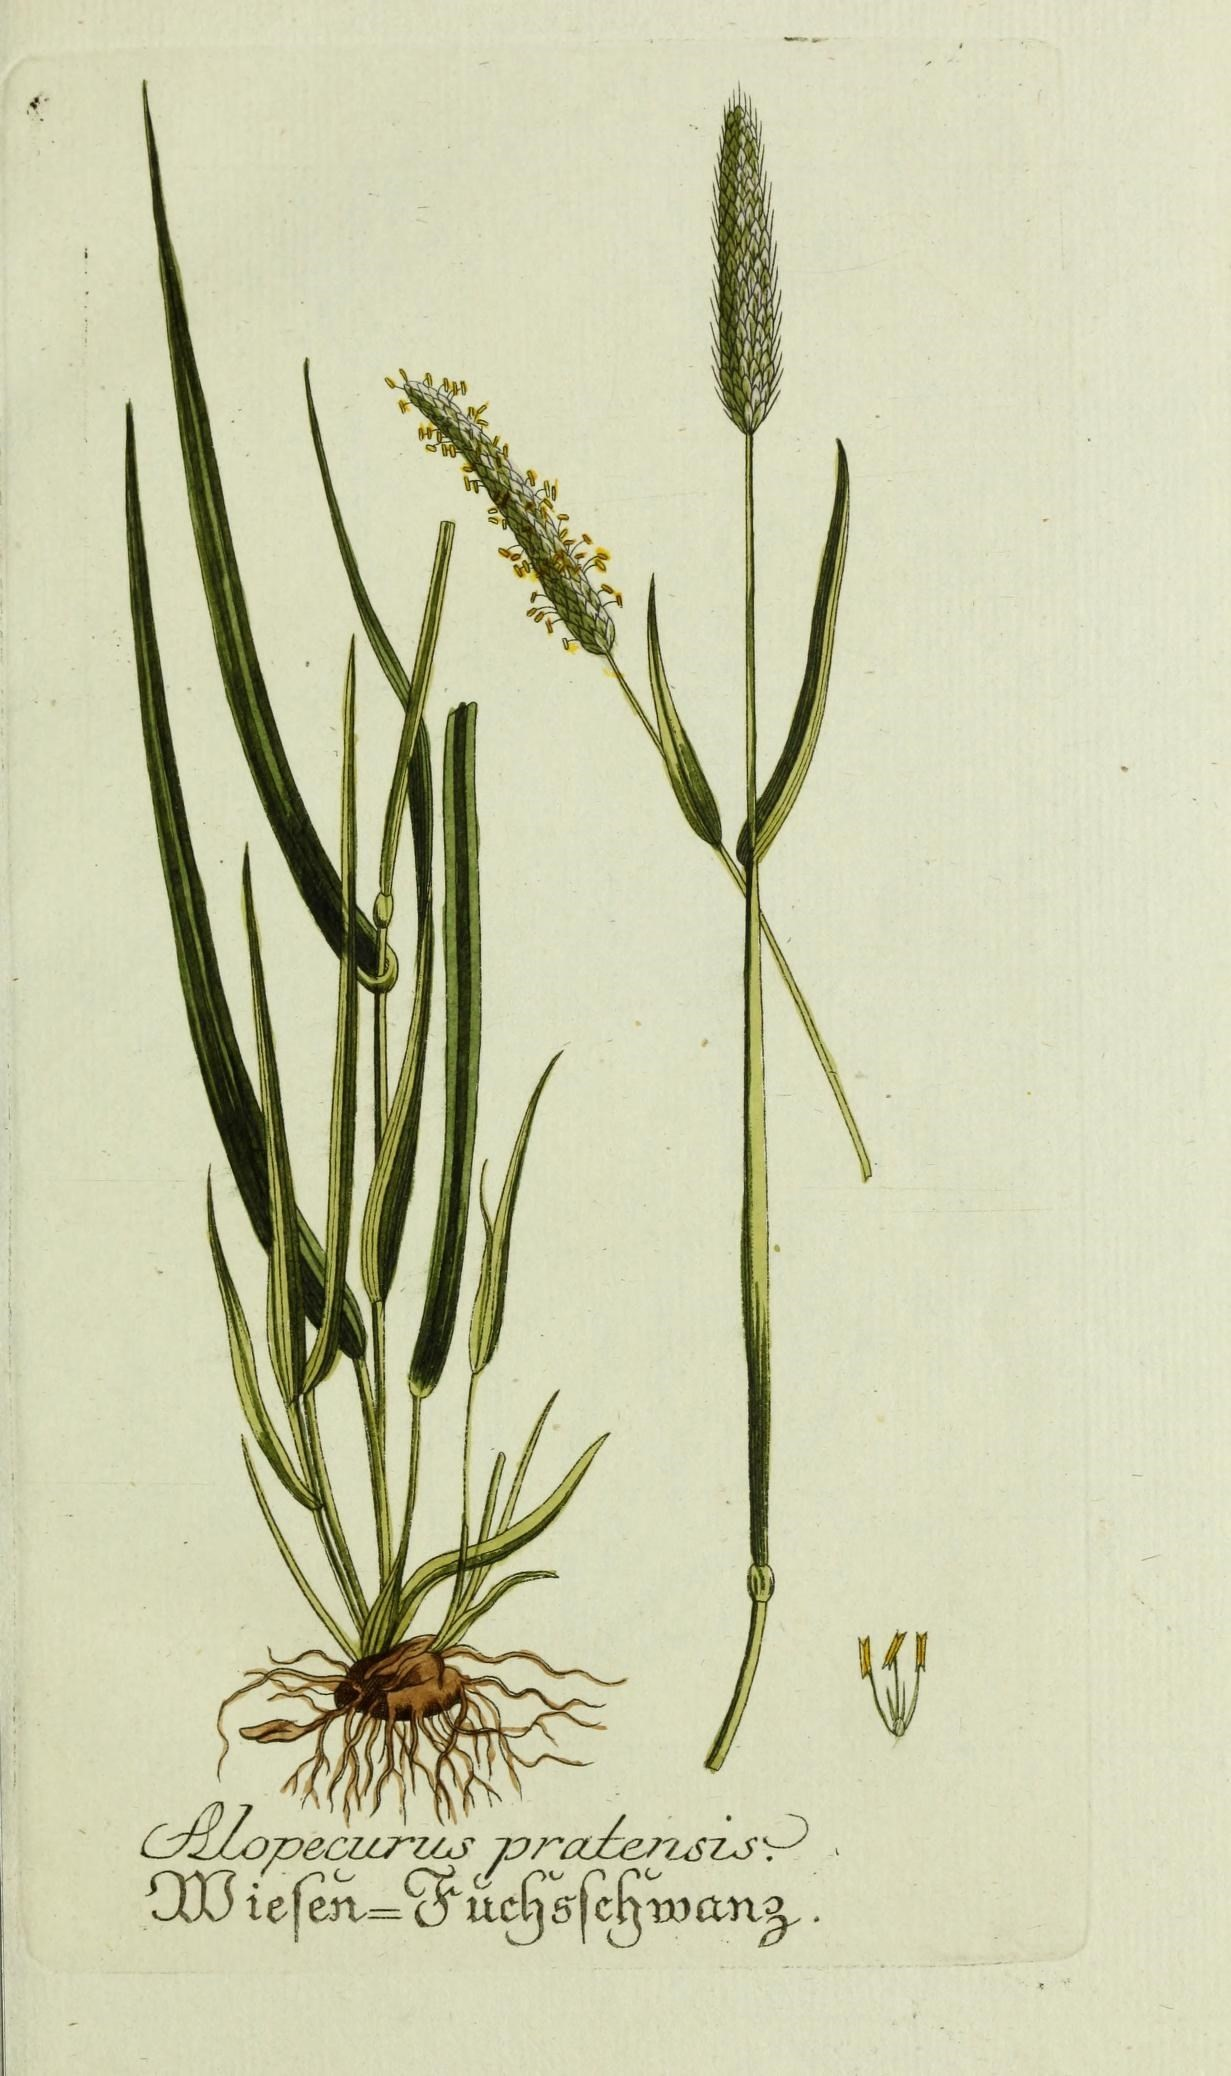 meadow foxtail - Encyclopedia of Life